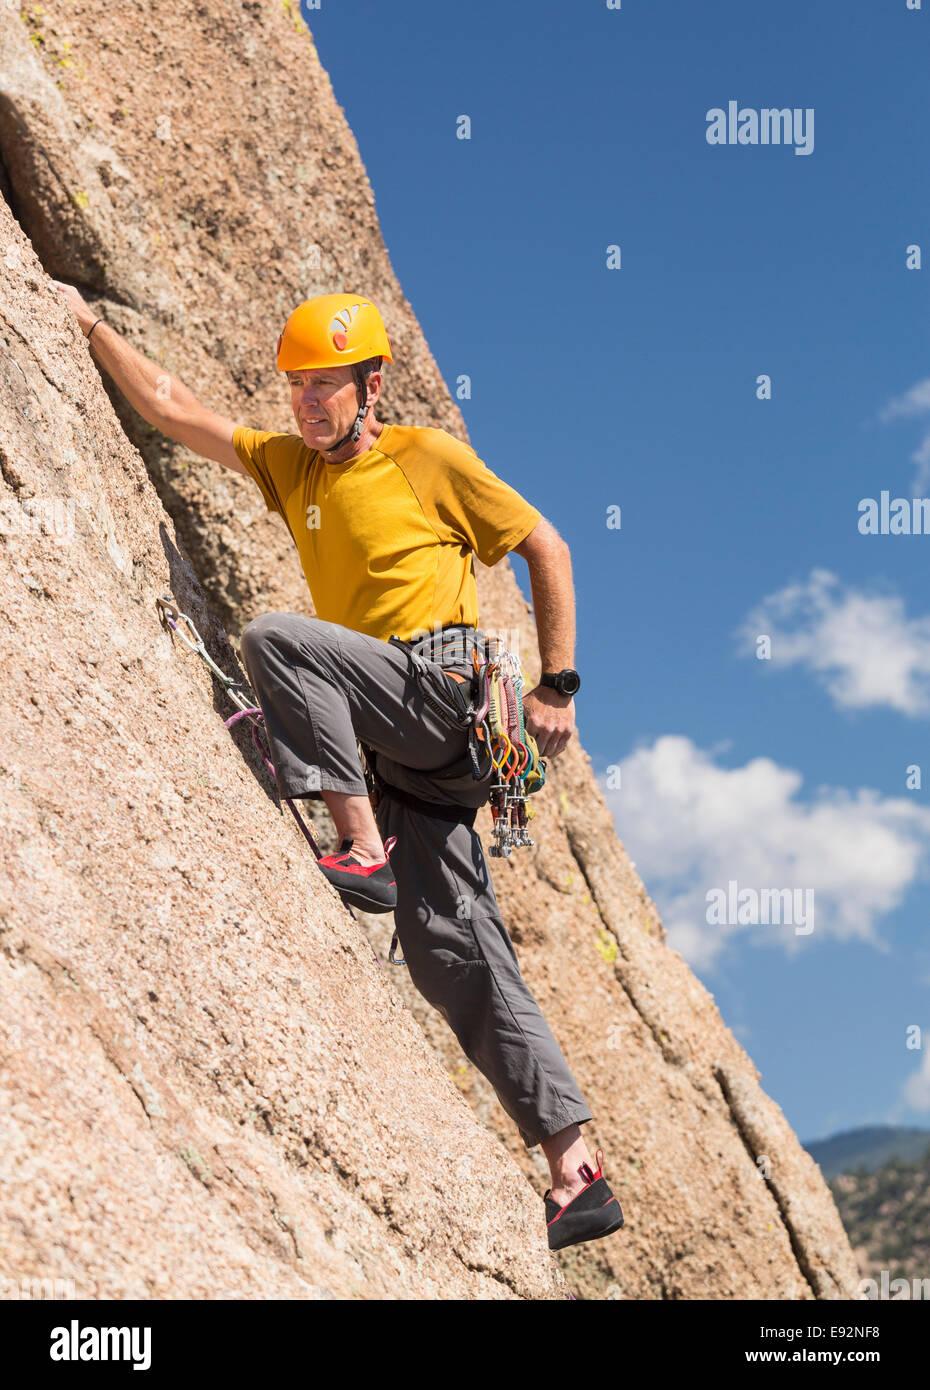 Senior male climber rock climbing on Turtle Rocks near Buena Vista, Colorado, USA - Stock Image